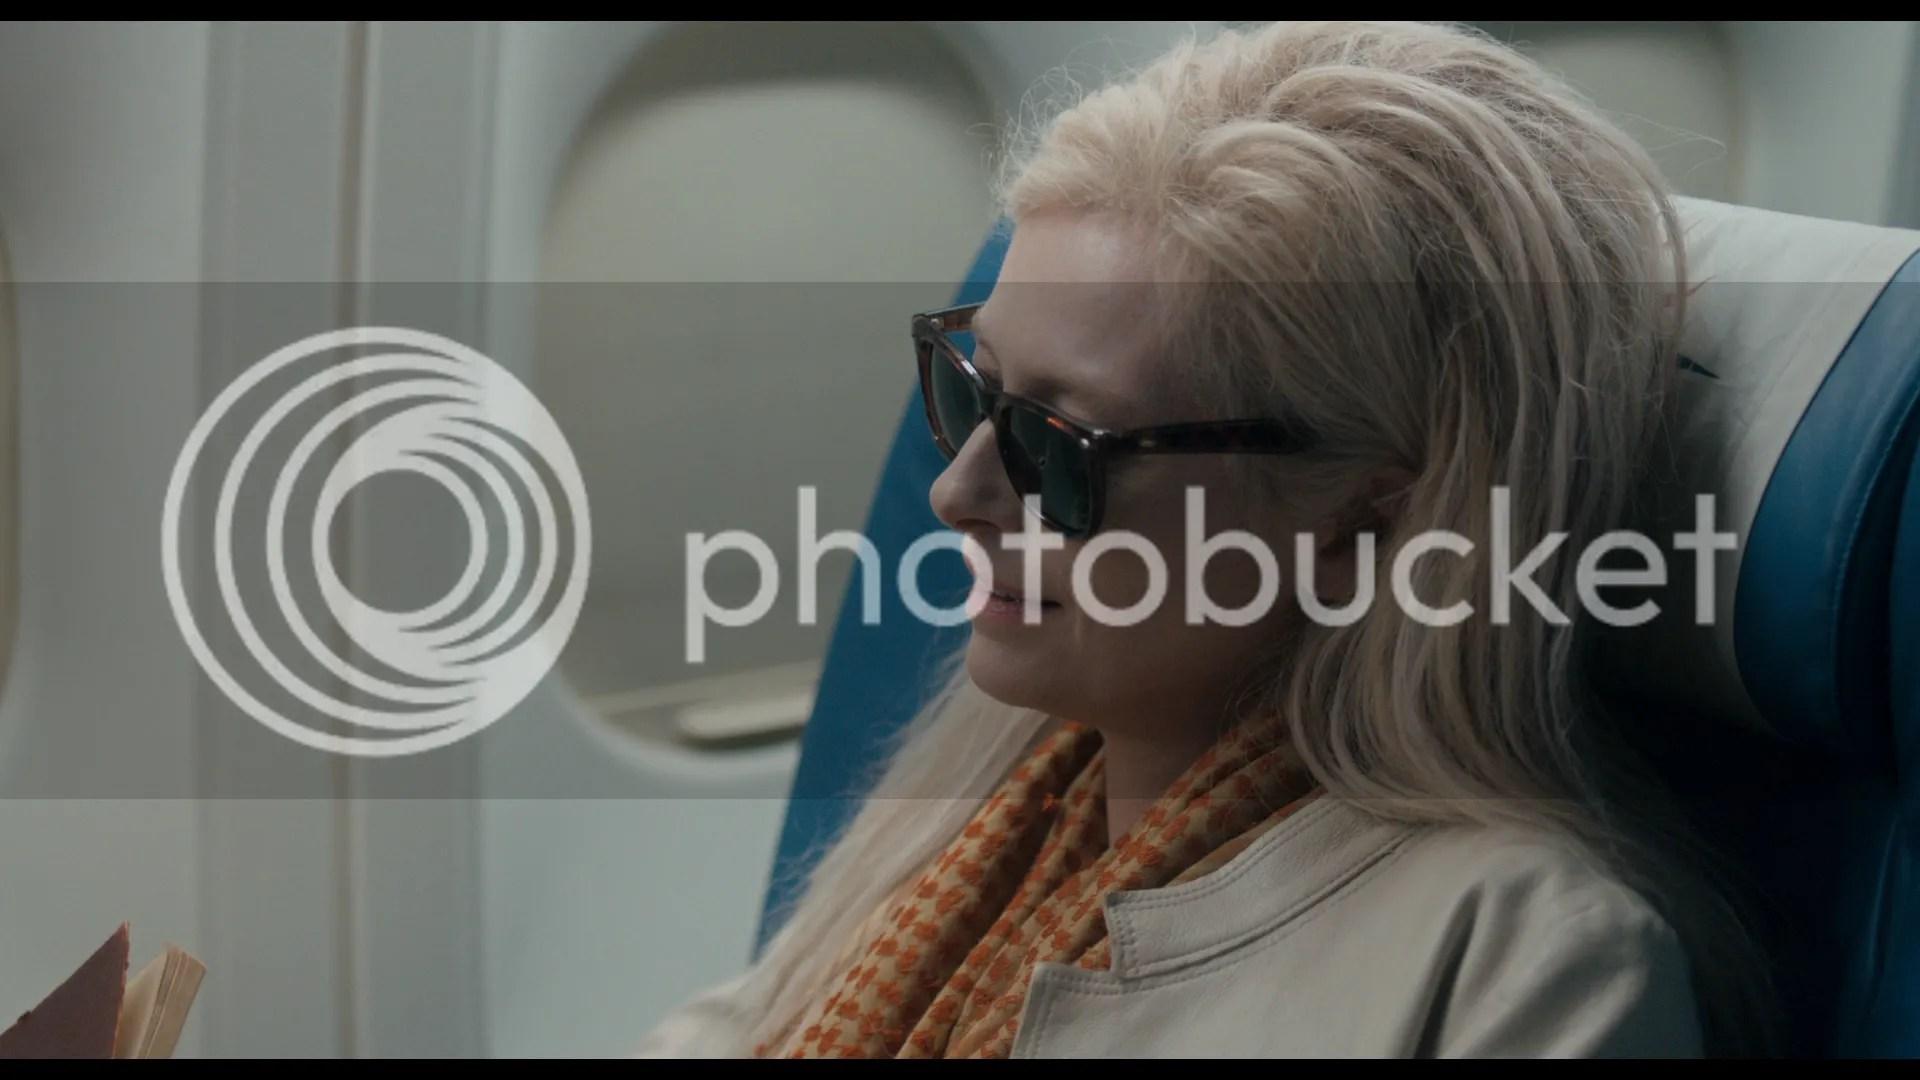 http://i133.photobucket.com/albums/q80/trungcang/H6/AQMi3a5_zps8304e8c6.png~original